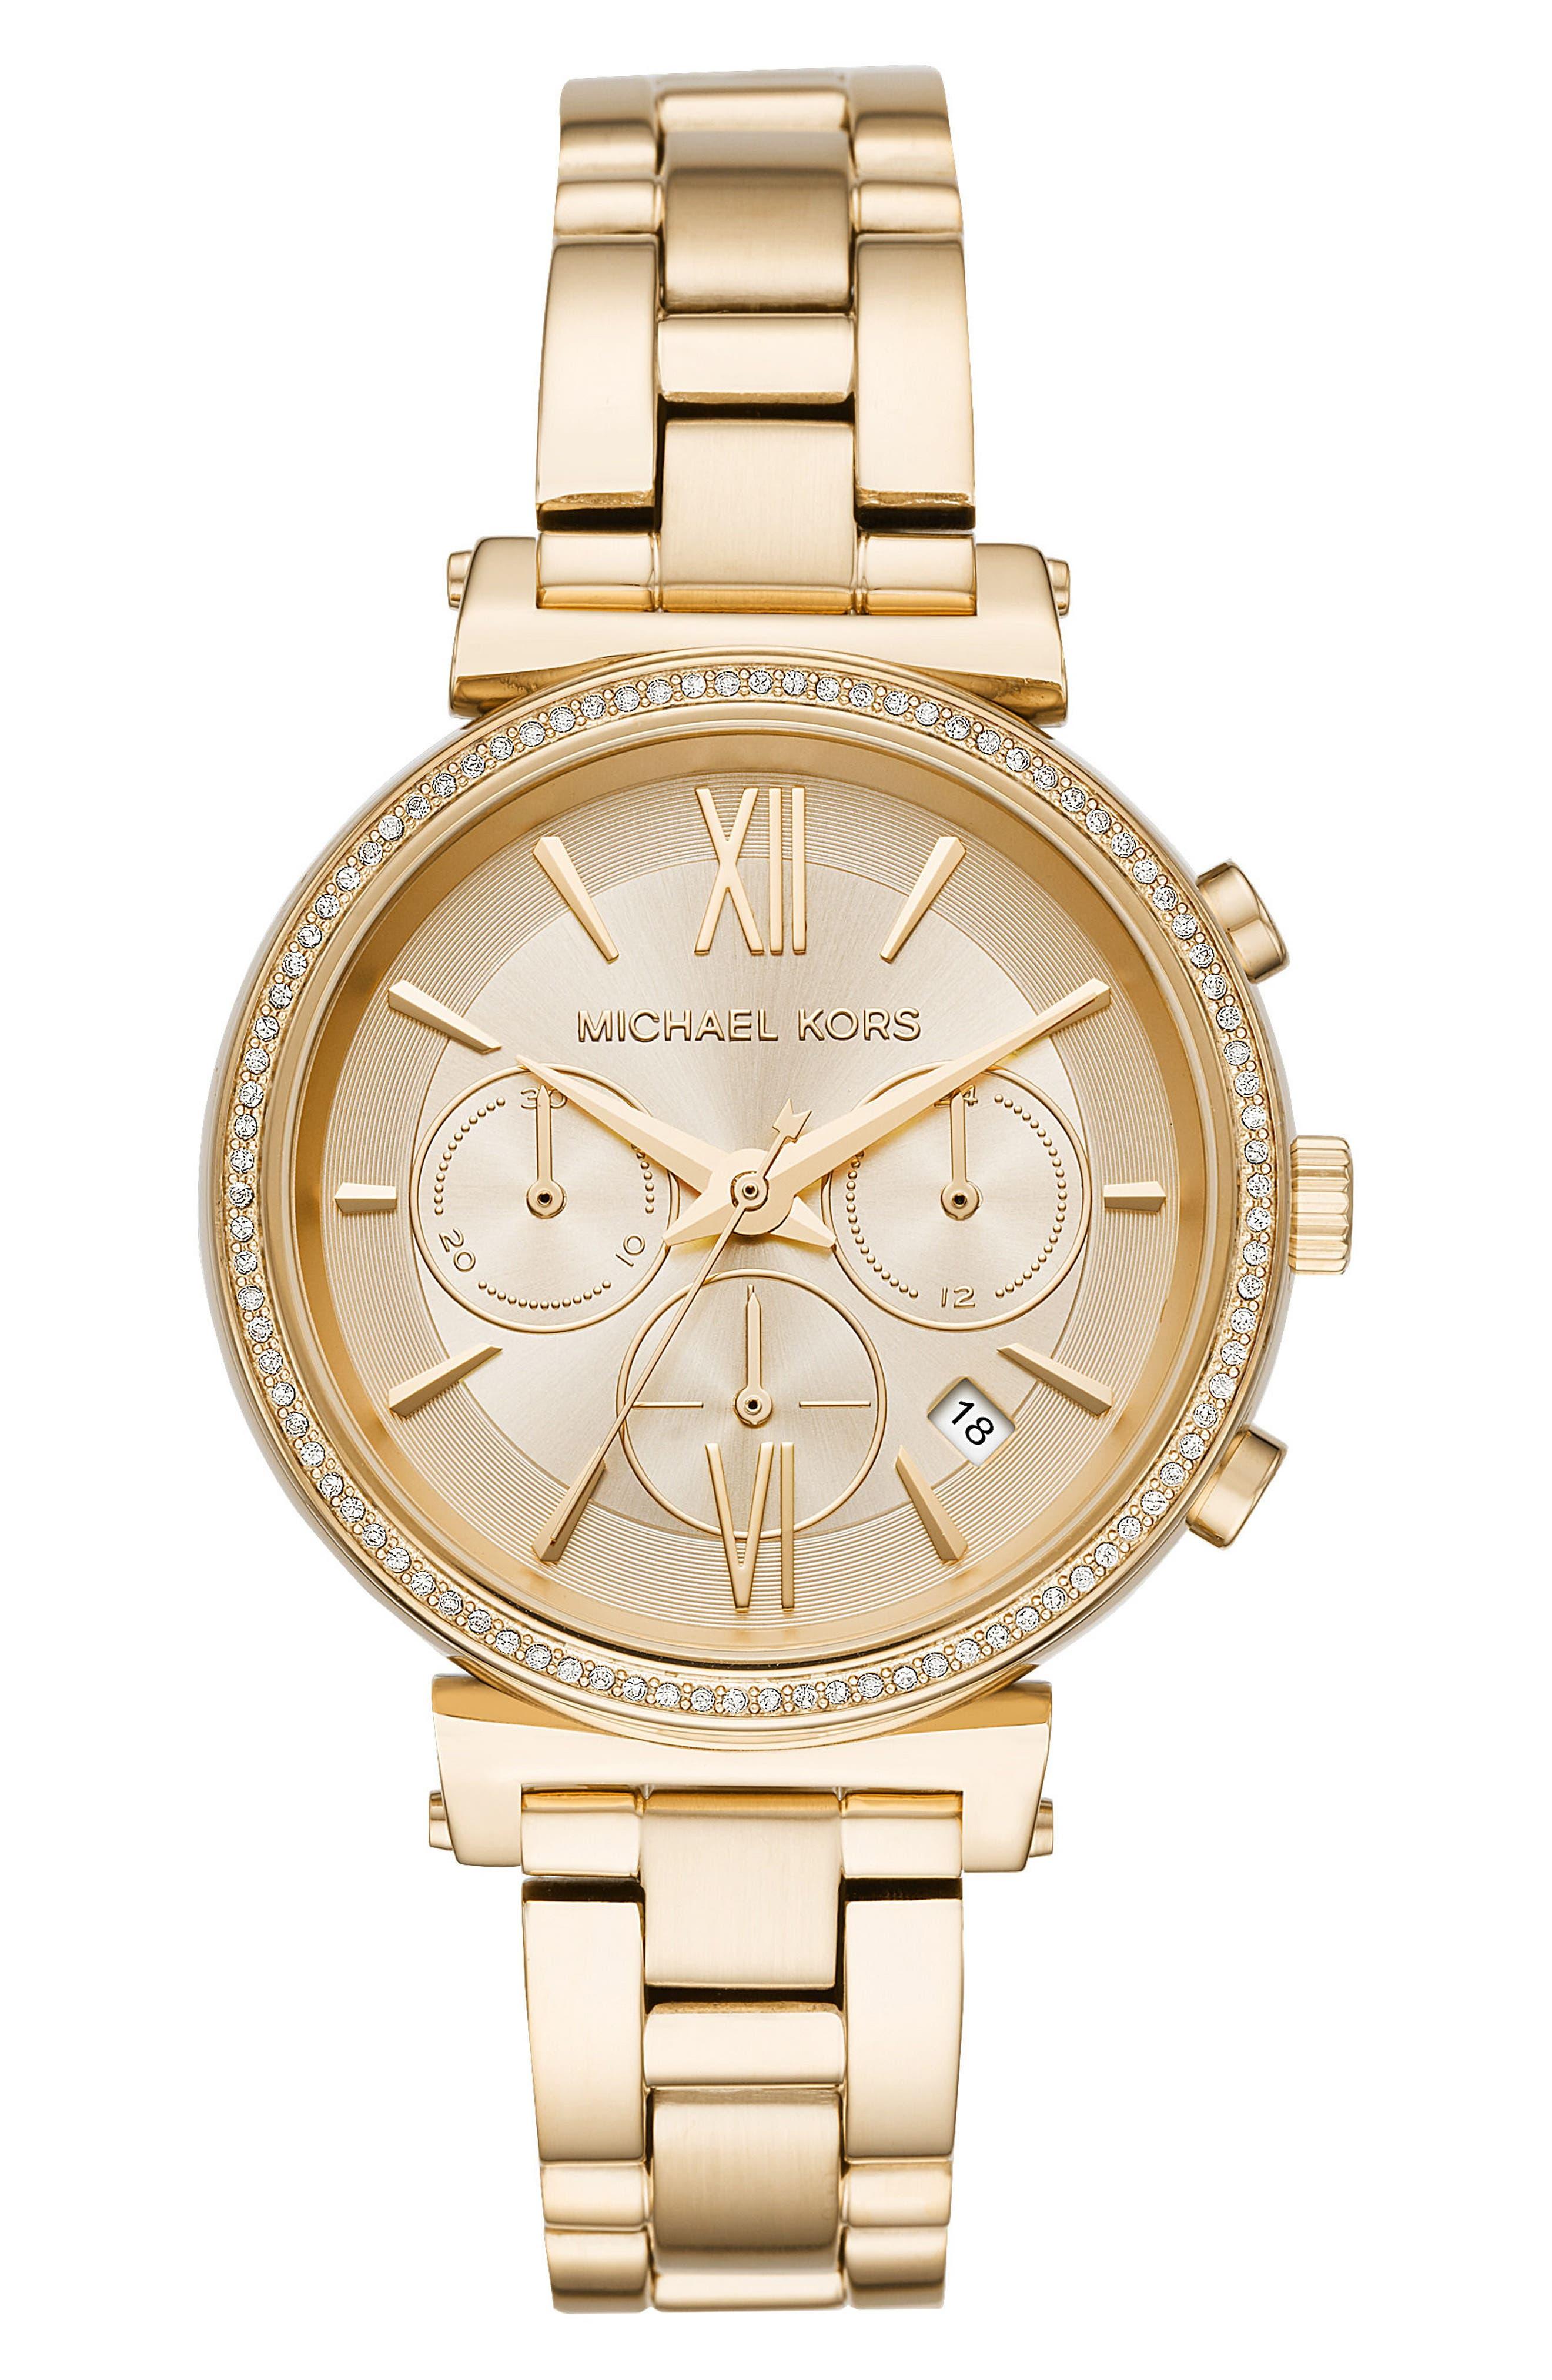 Main Image - Michael Kors Sofie Chronograph Bracelet Watch, 39mm